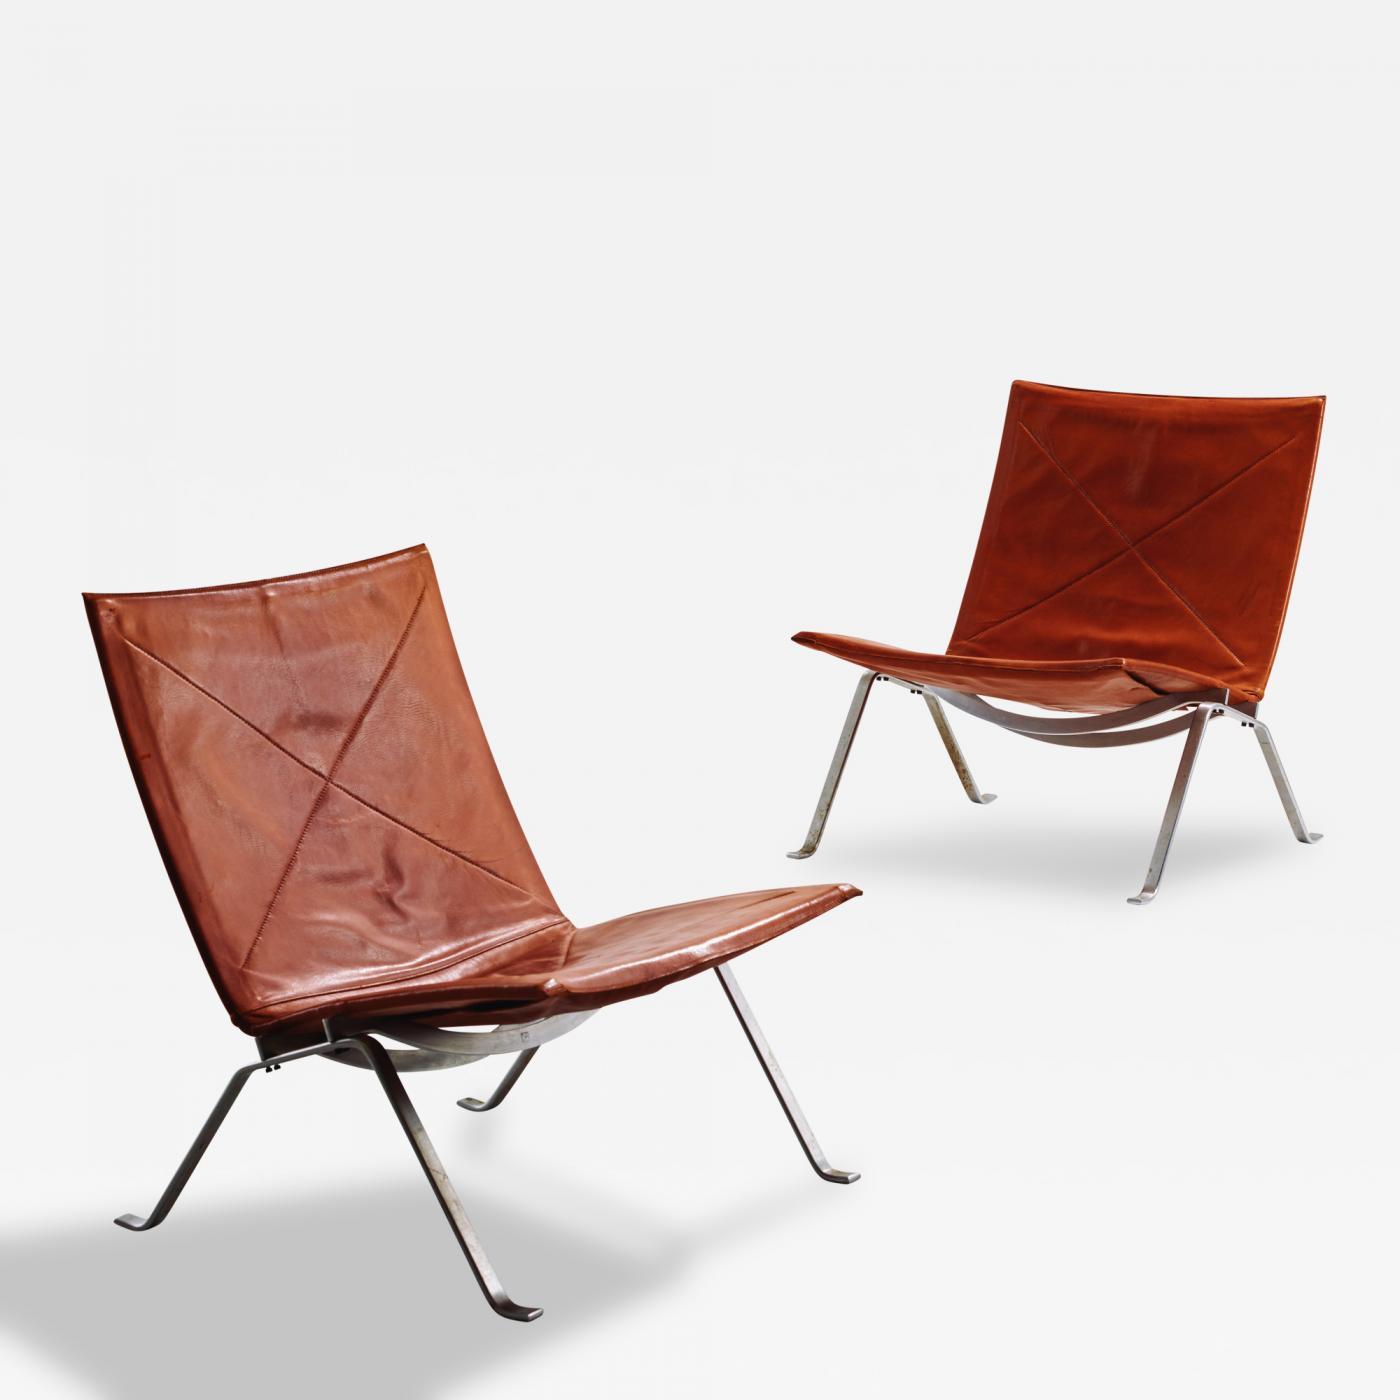 Listings / Furniture / Seating / Lounge Chairs · Poul Kjaerholm ...